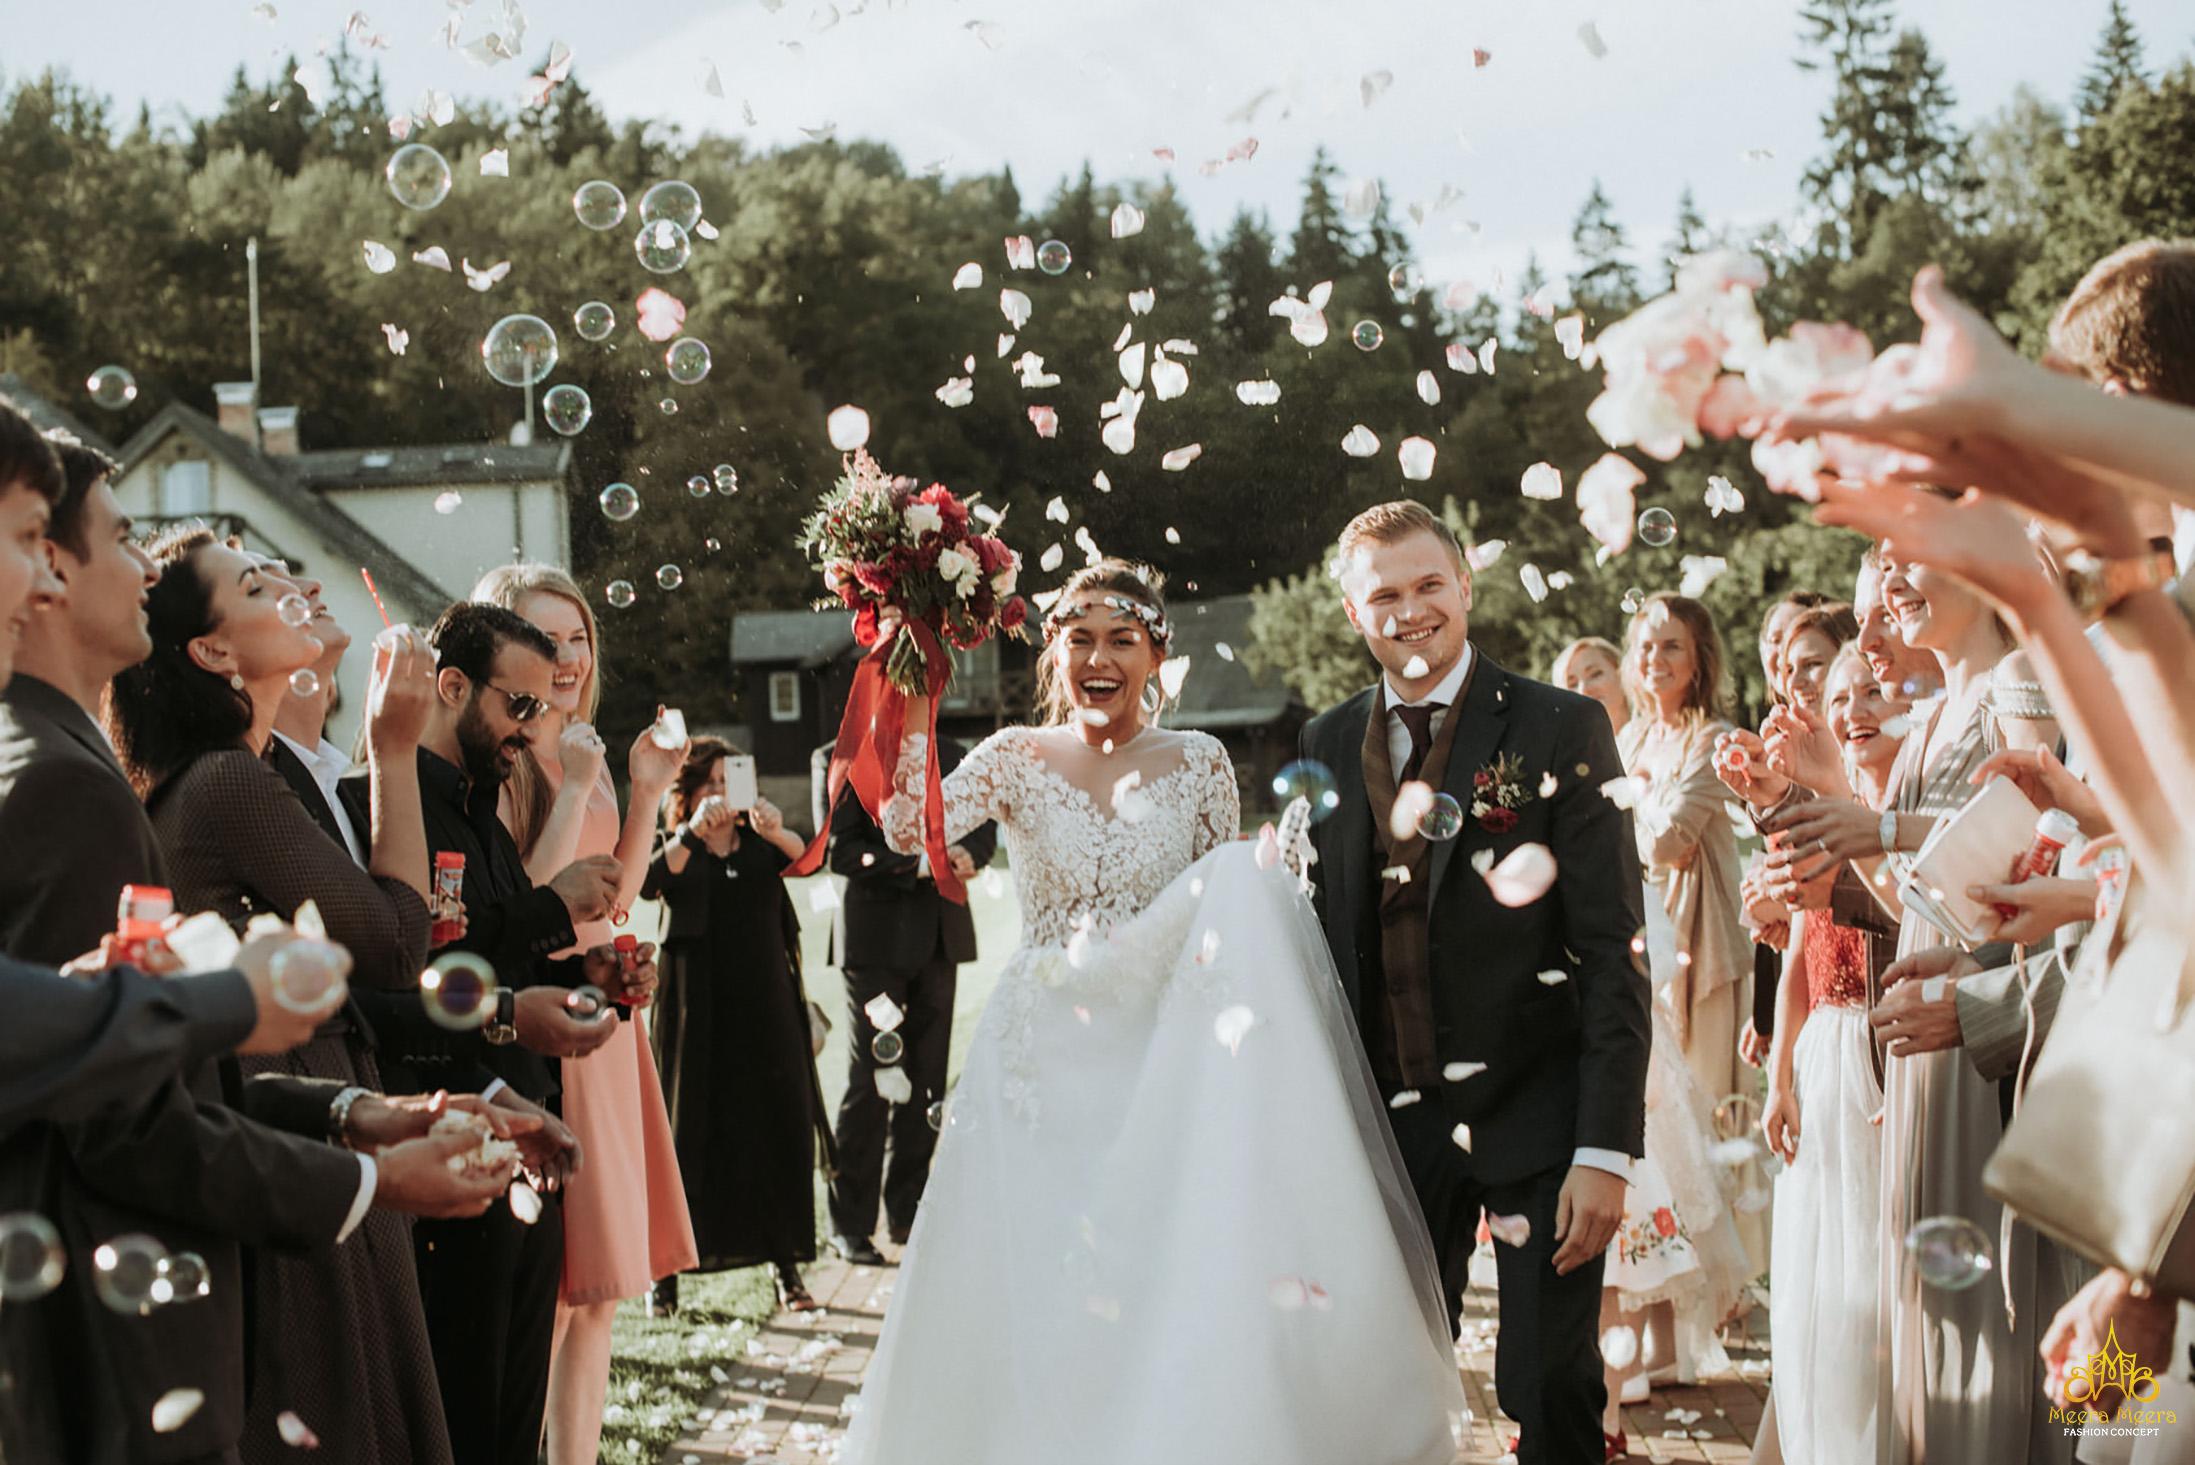 our-real-brides-meera-meera-fashion-concept-hinh-anh-co-dau-feedback-review-ao-cuoi-meera-meera